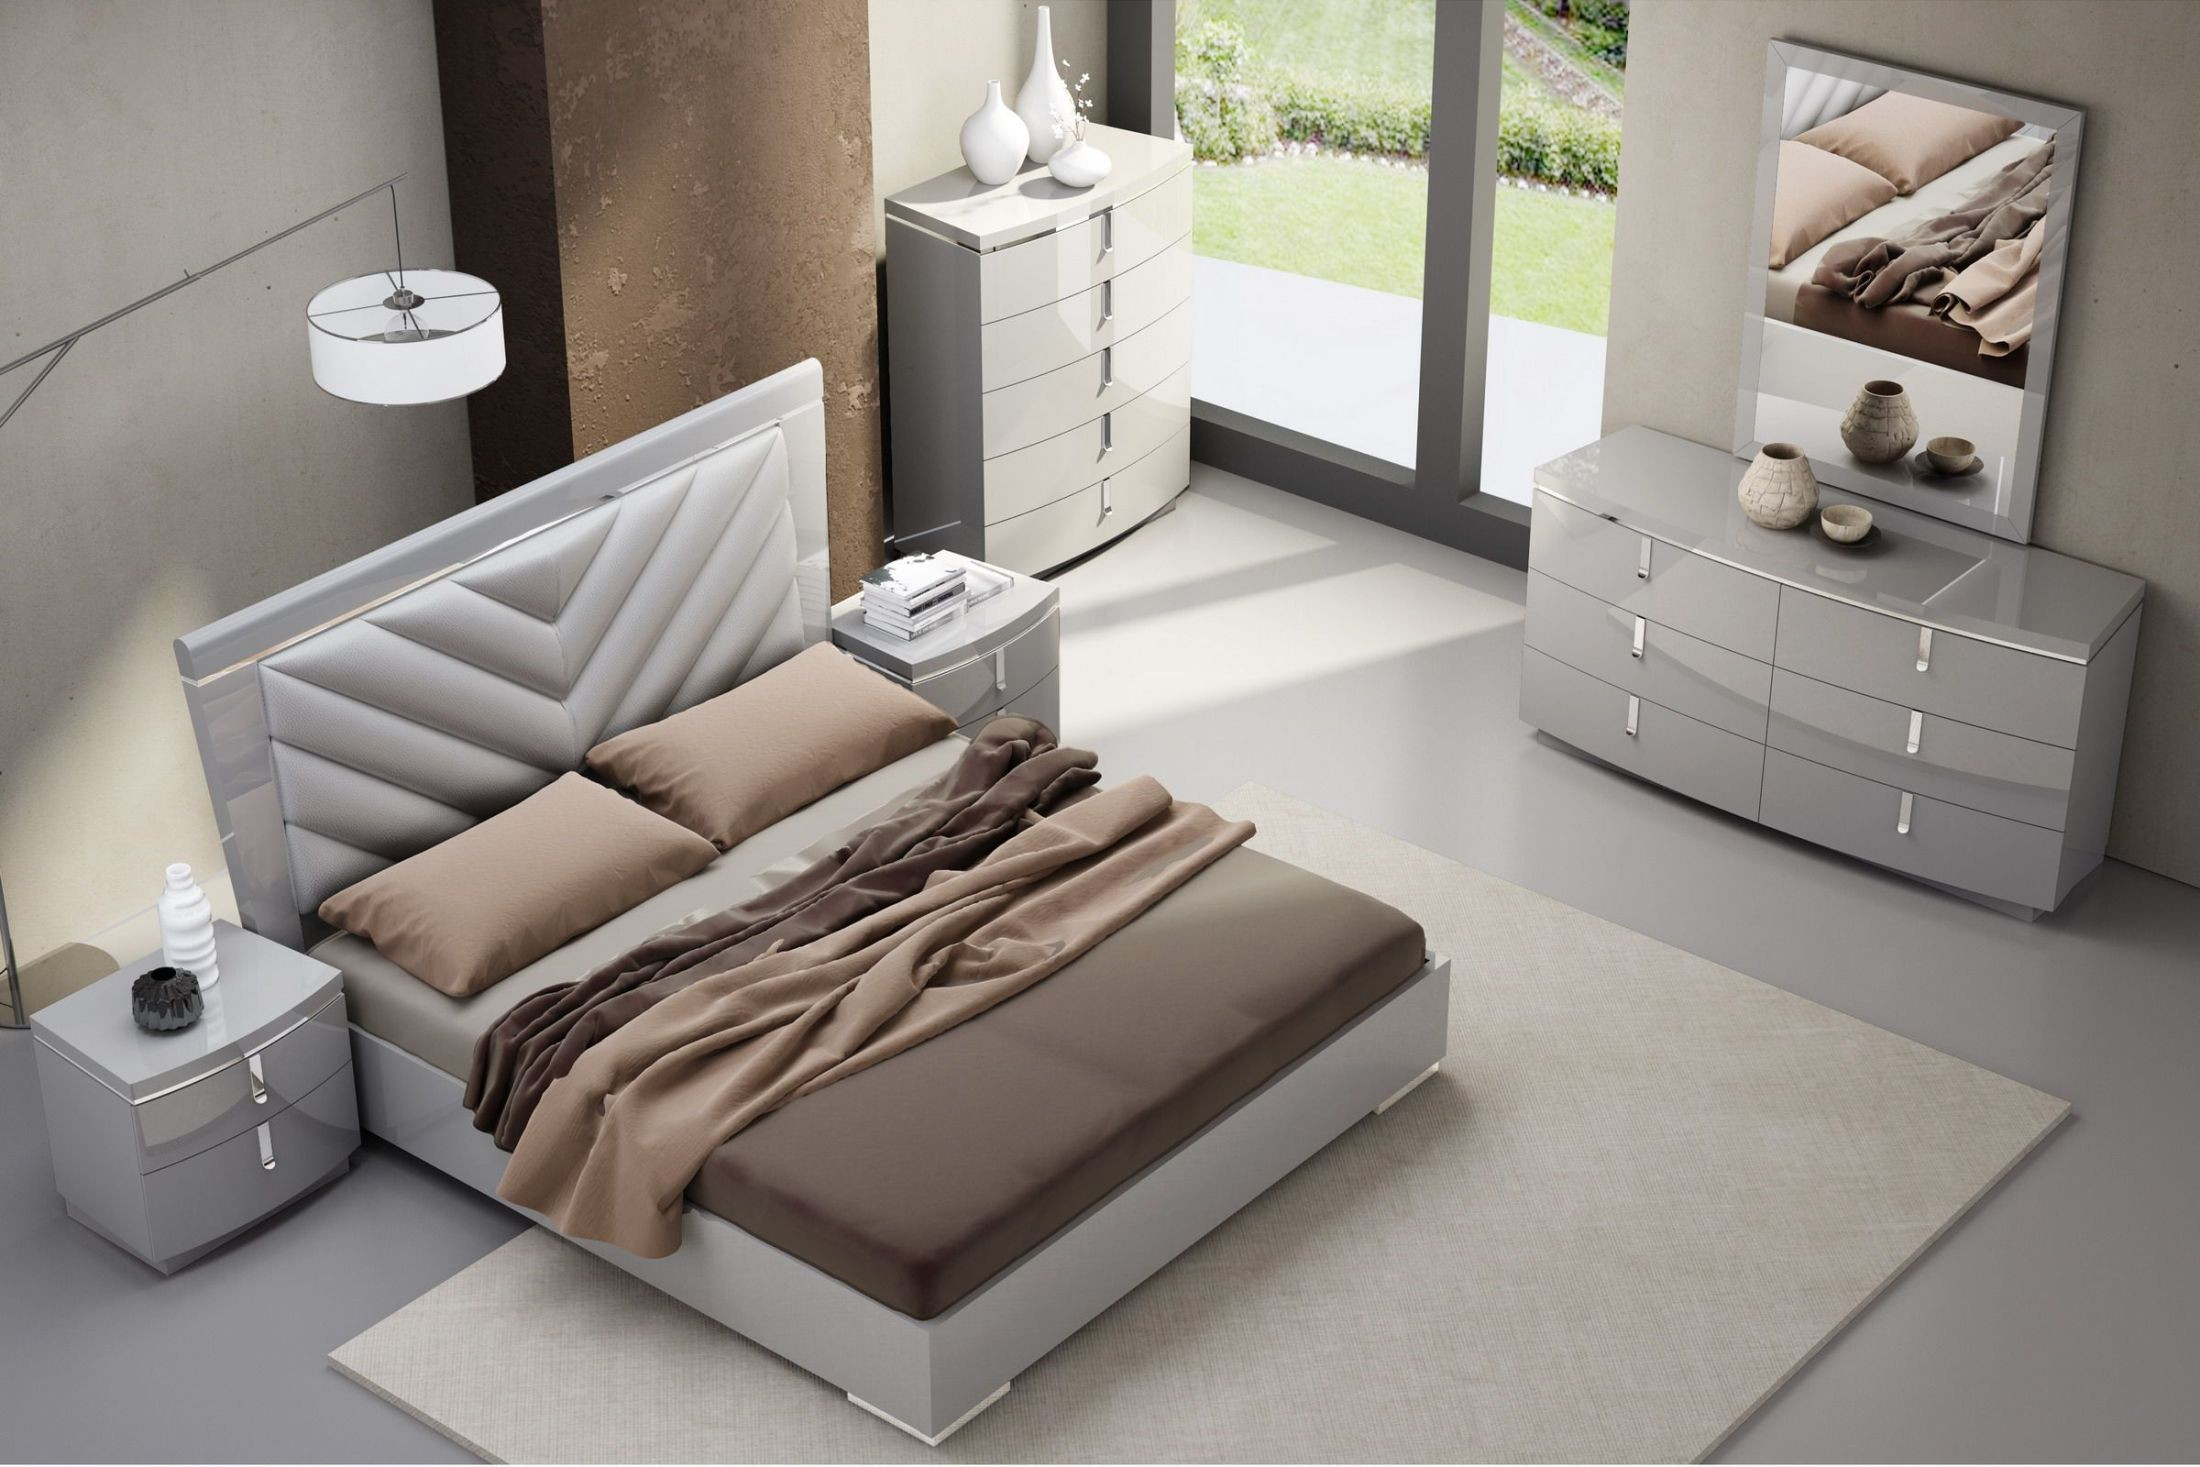 New York Gray Upholstered Platform Bedroom Set, 18215-Q, J&M